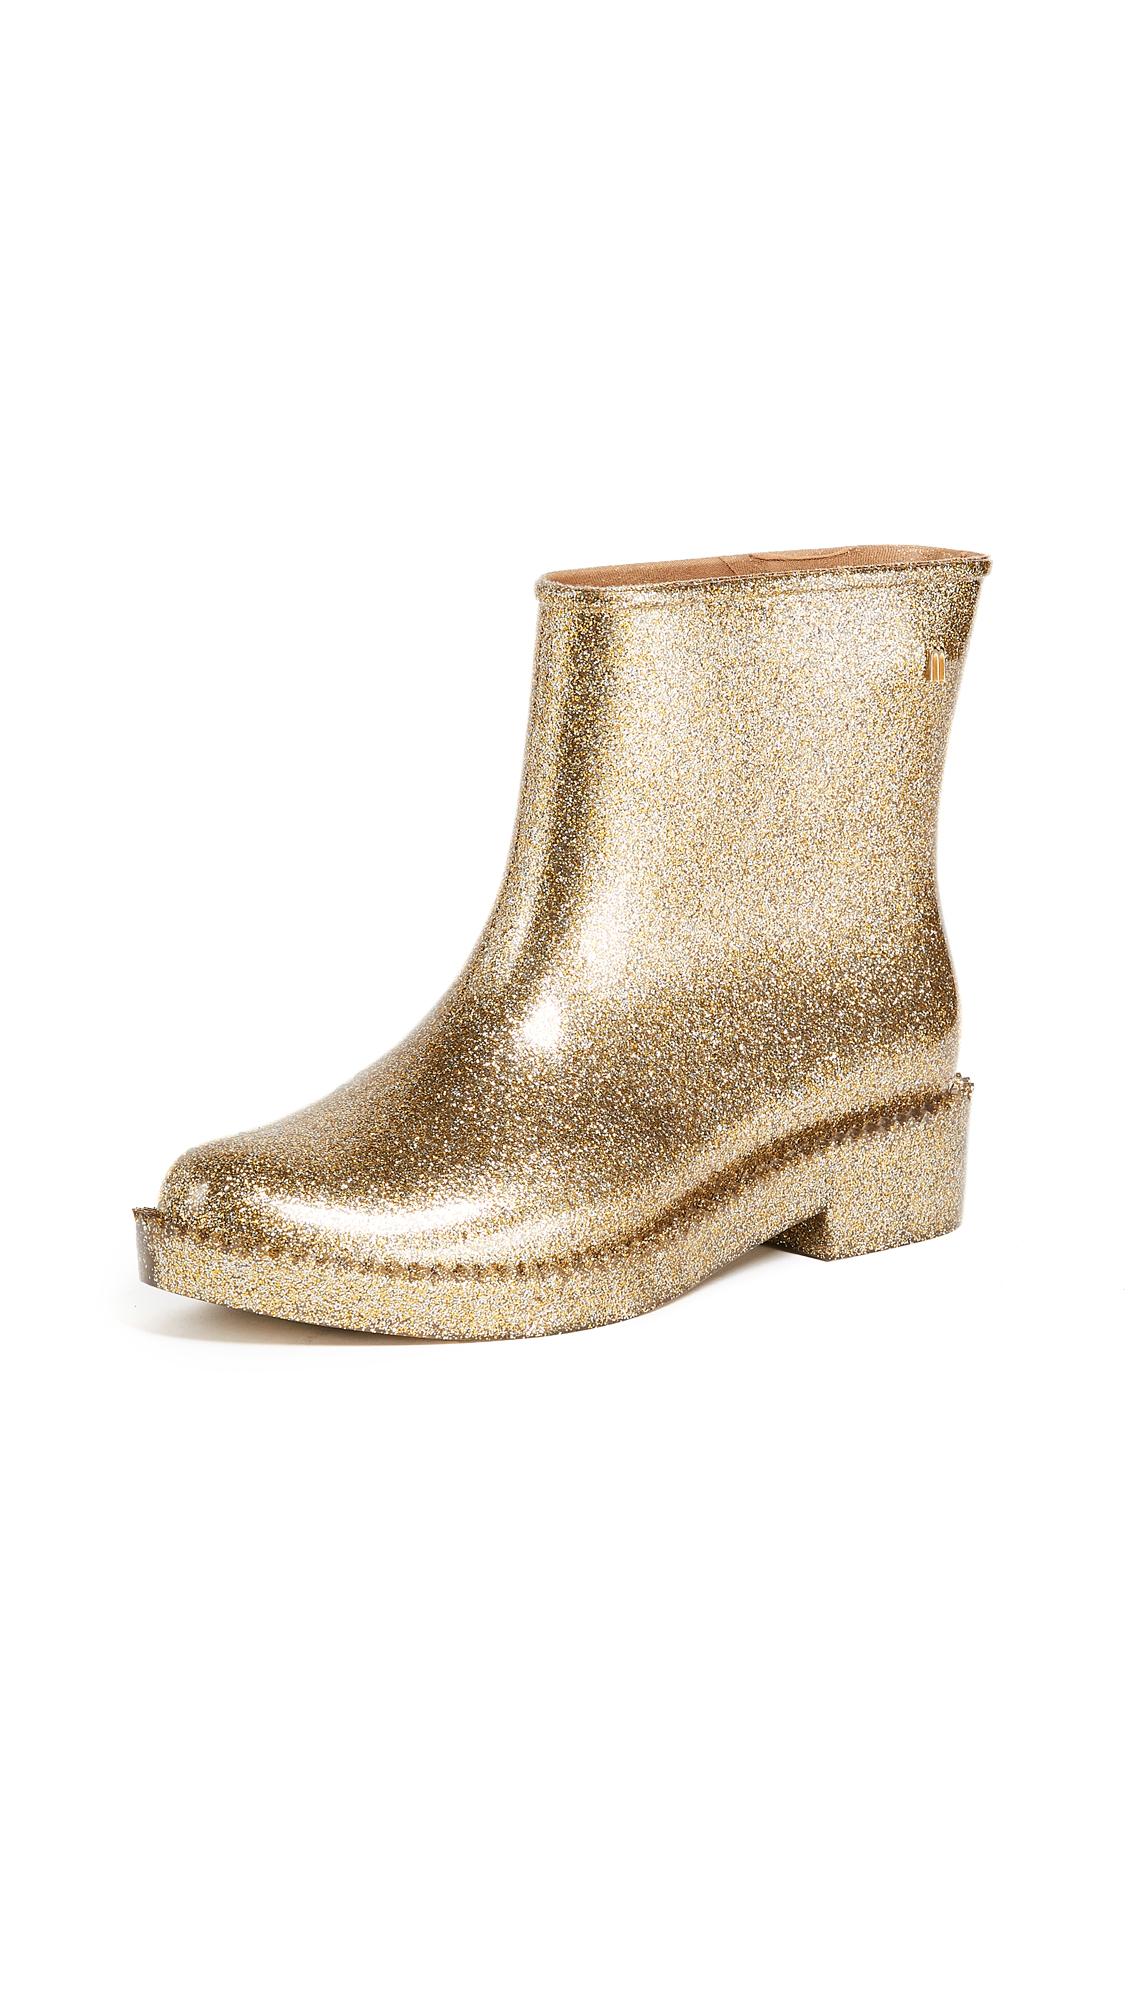 Melissa Drop Rain Boots - Gold Glitter